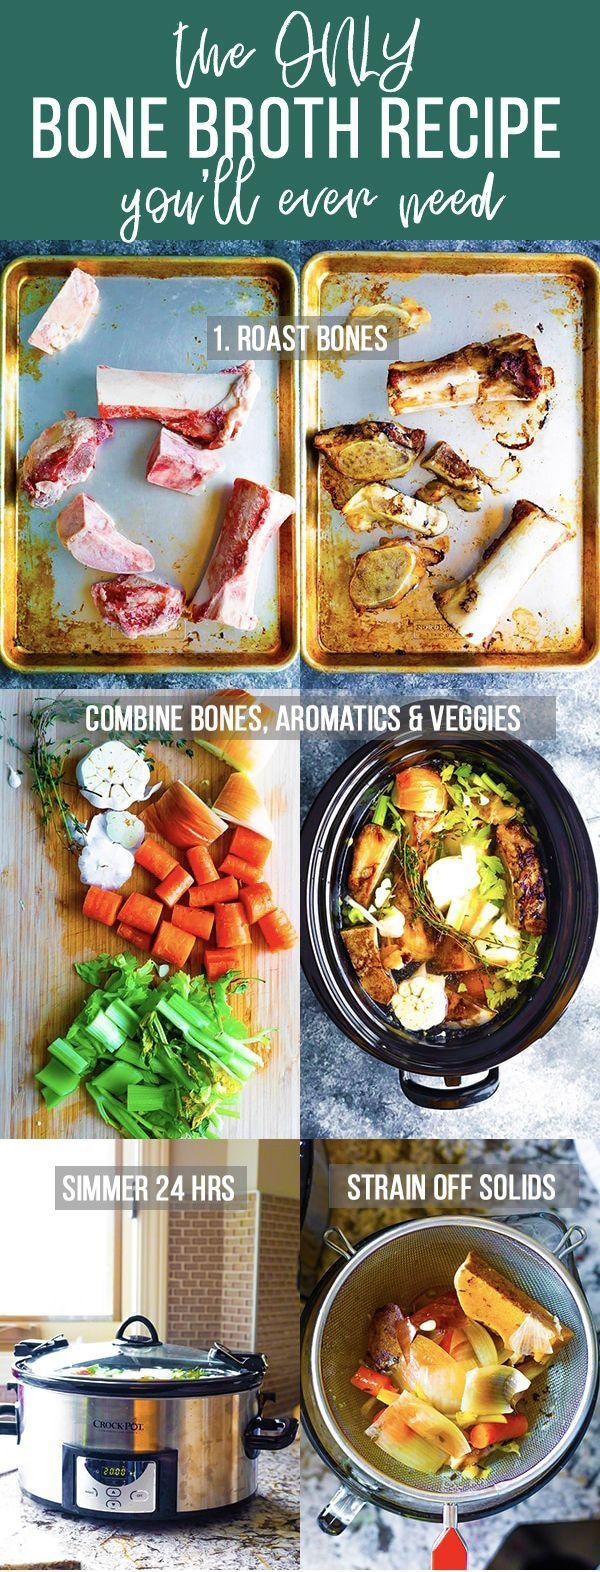 The ONLY Bone Broth Recipe You'll Ever Need | sweetpeasandsaffron.com